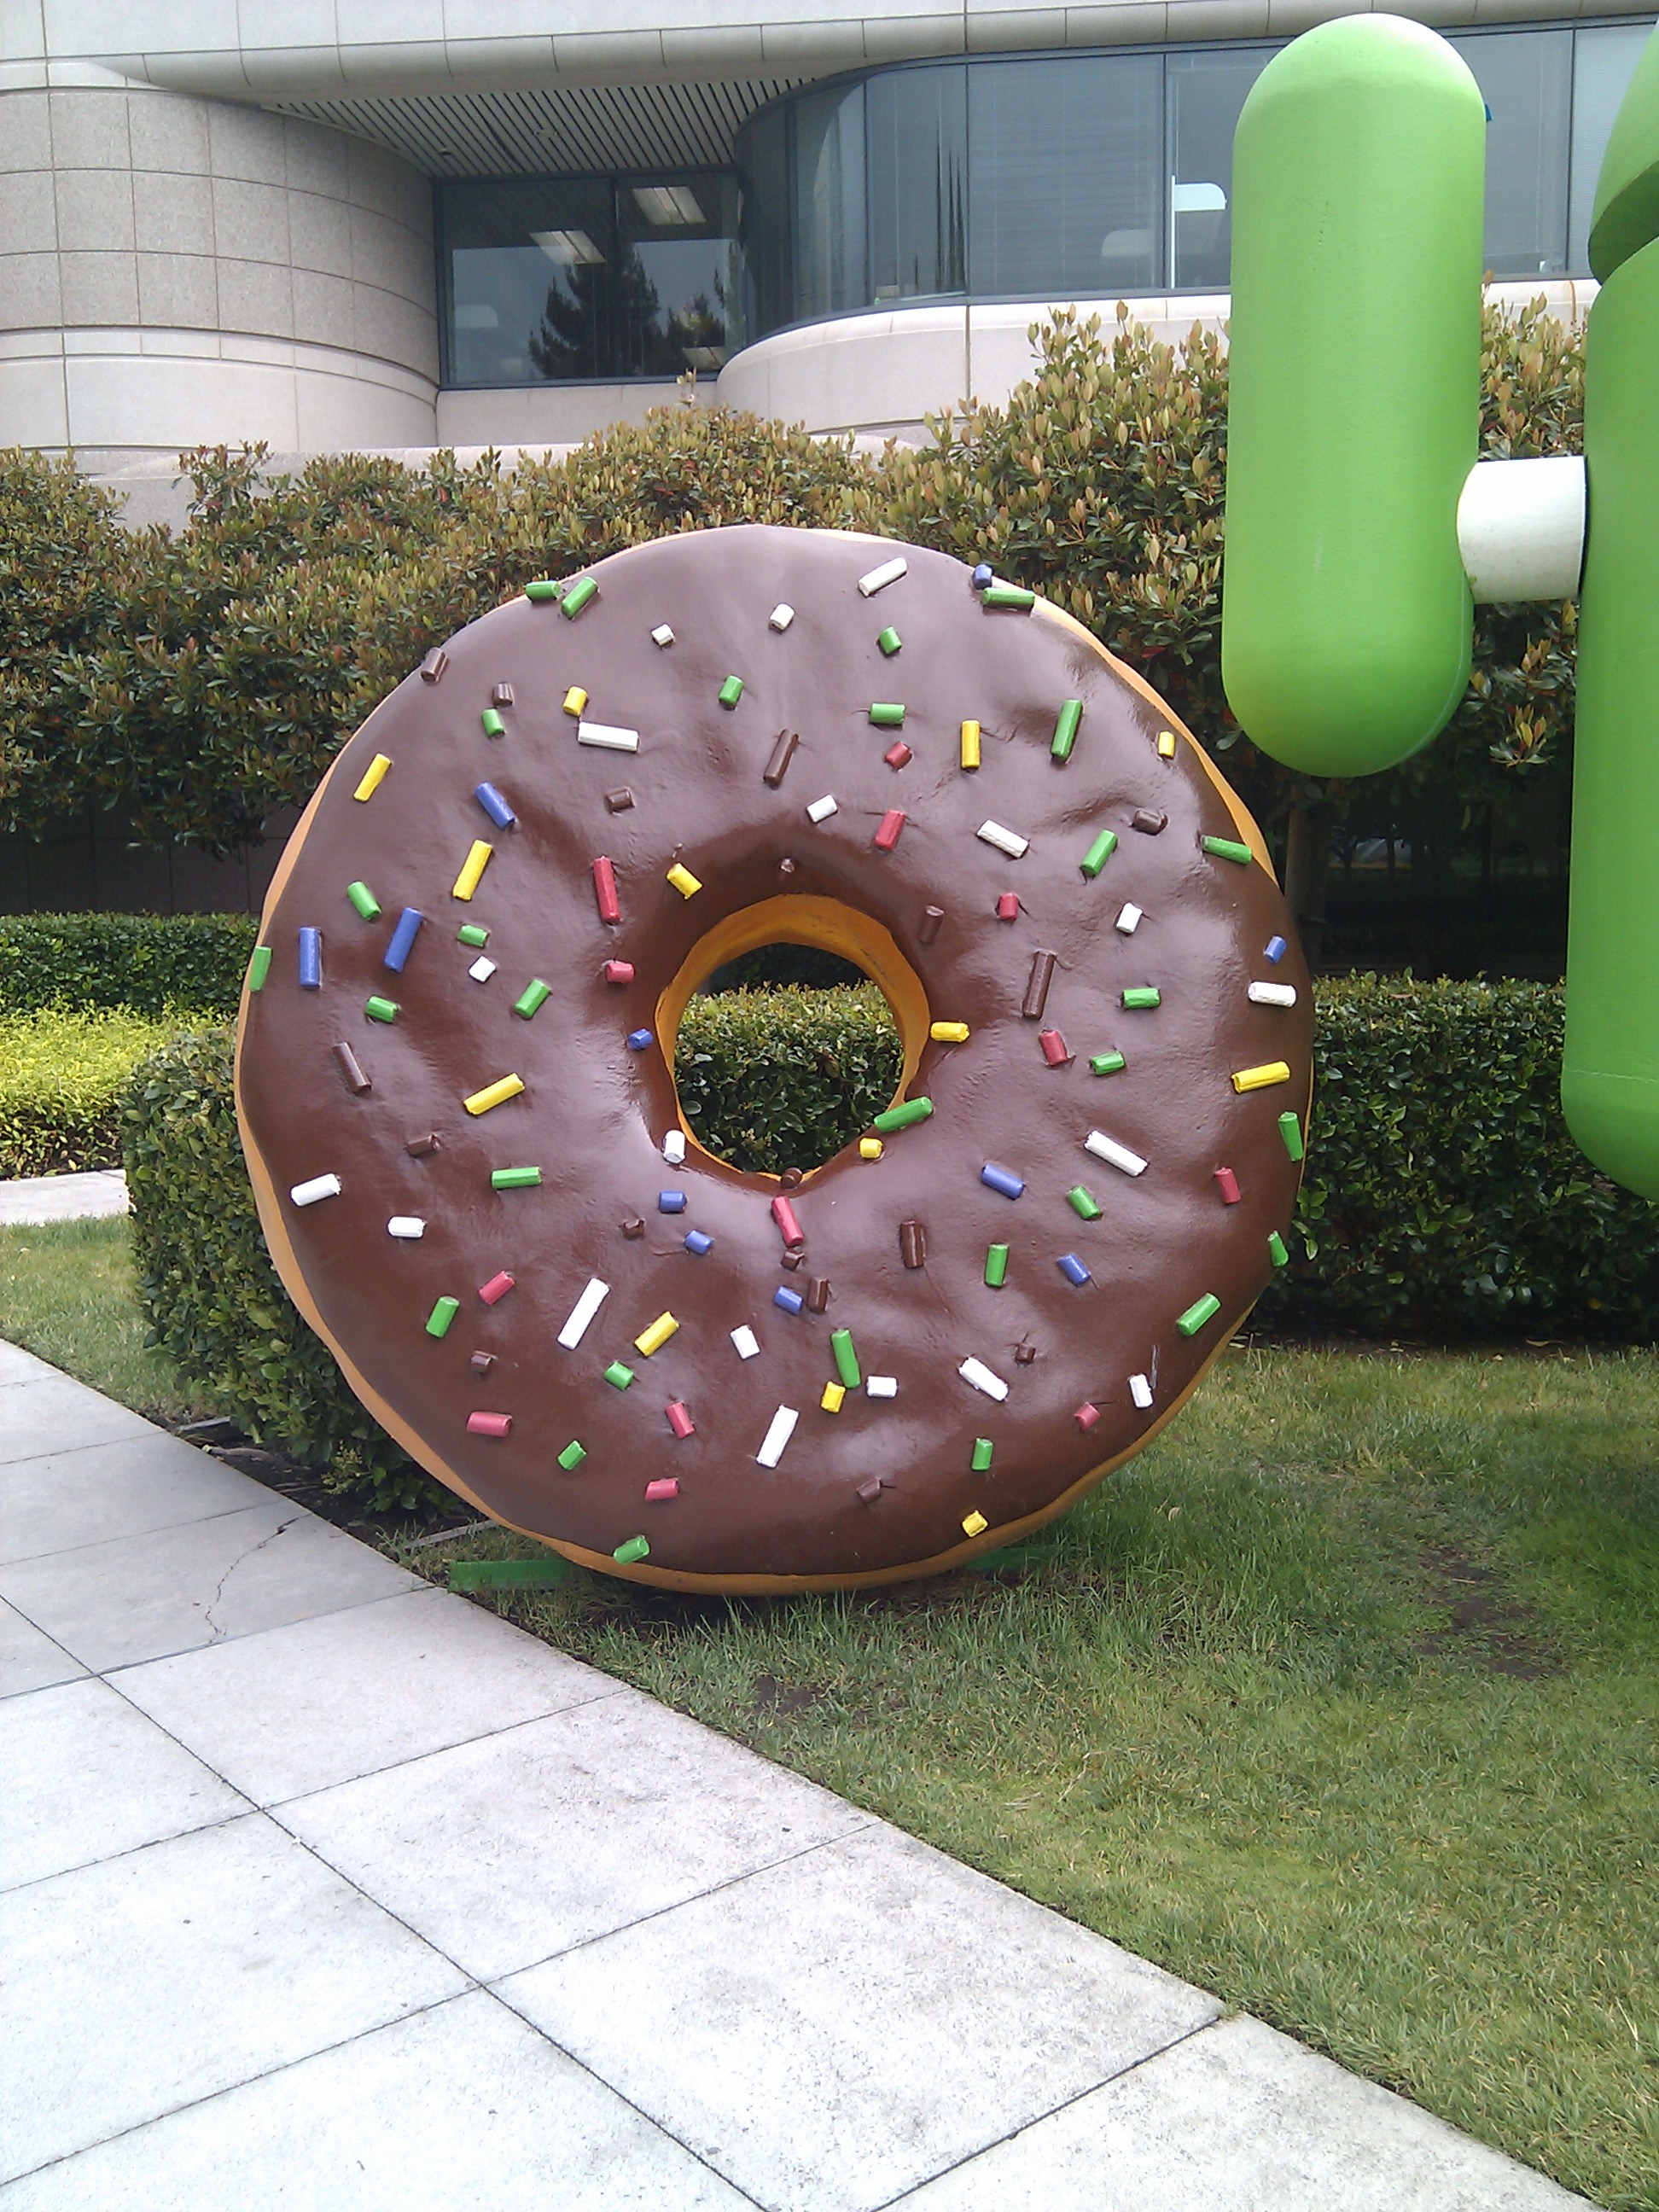 Doughnut android statue